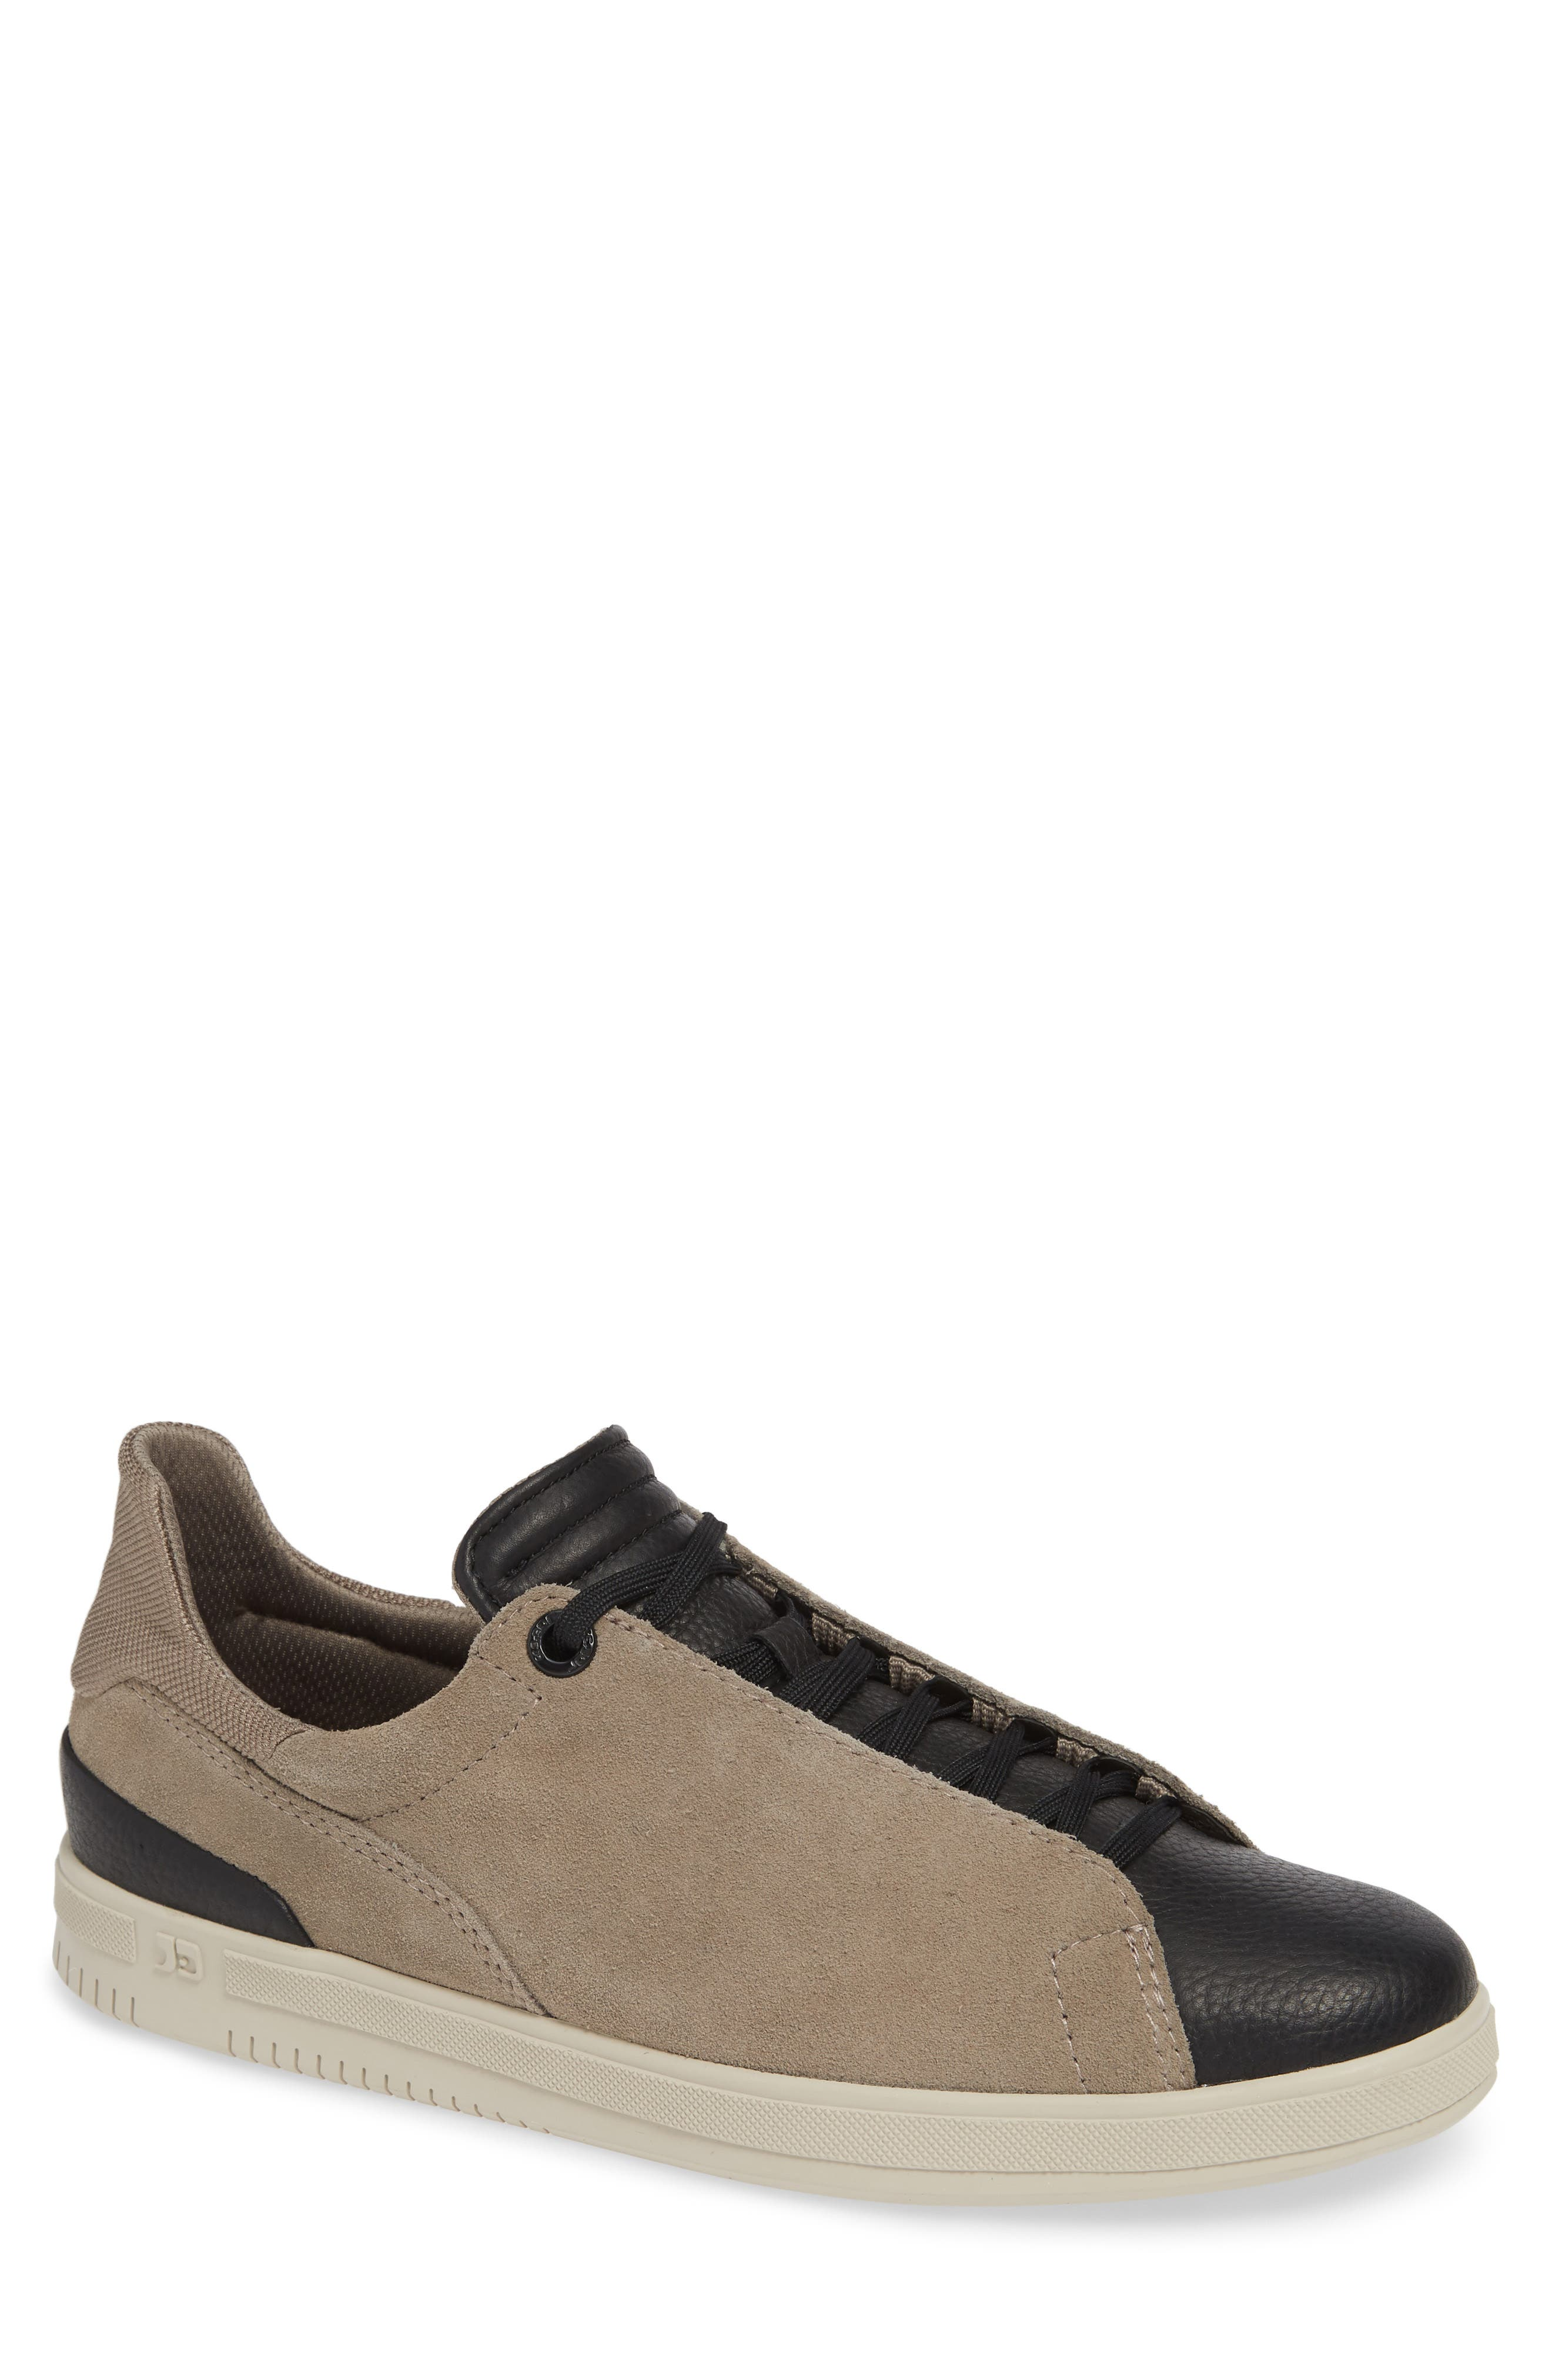 Joe Papa Low Top Sneaker,                             Main thumbnail 1, color,                             STONE/ BLACK